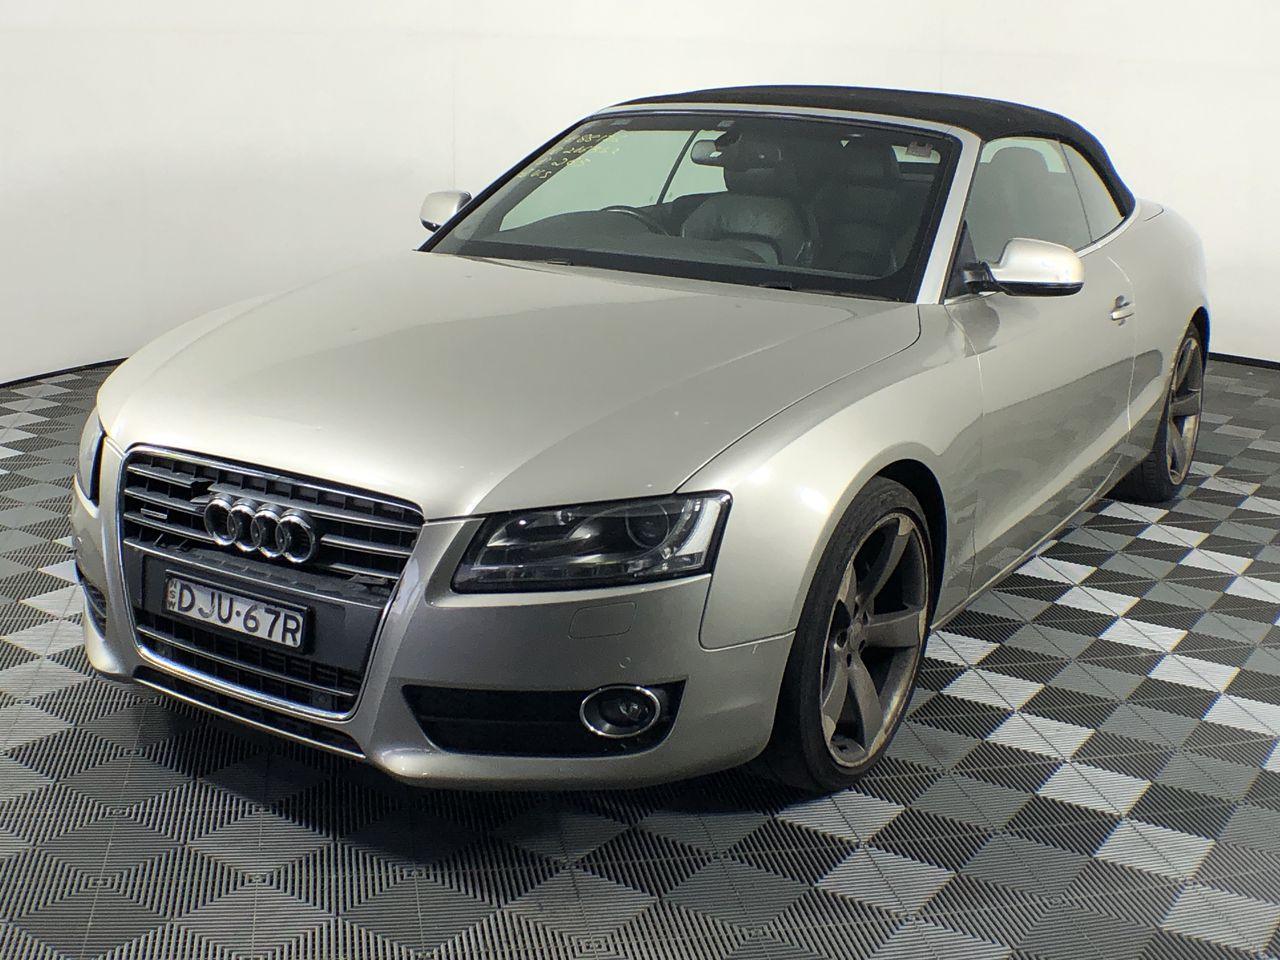 2010 Audi A5 2.0 TFSI Quattro 8T Automatic Convertible